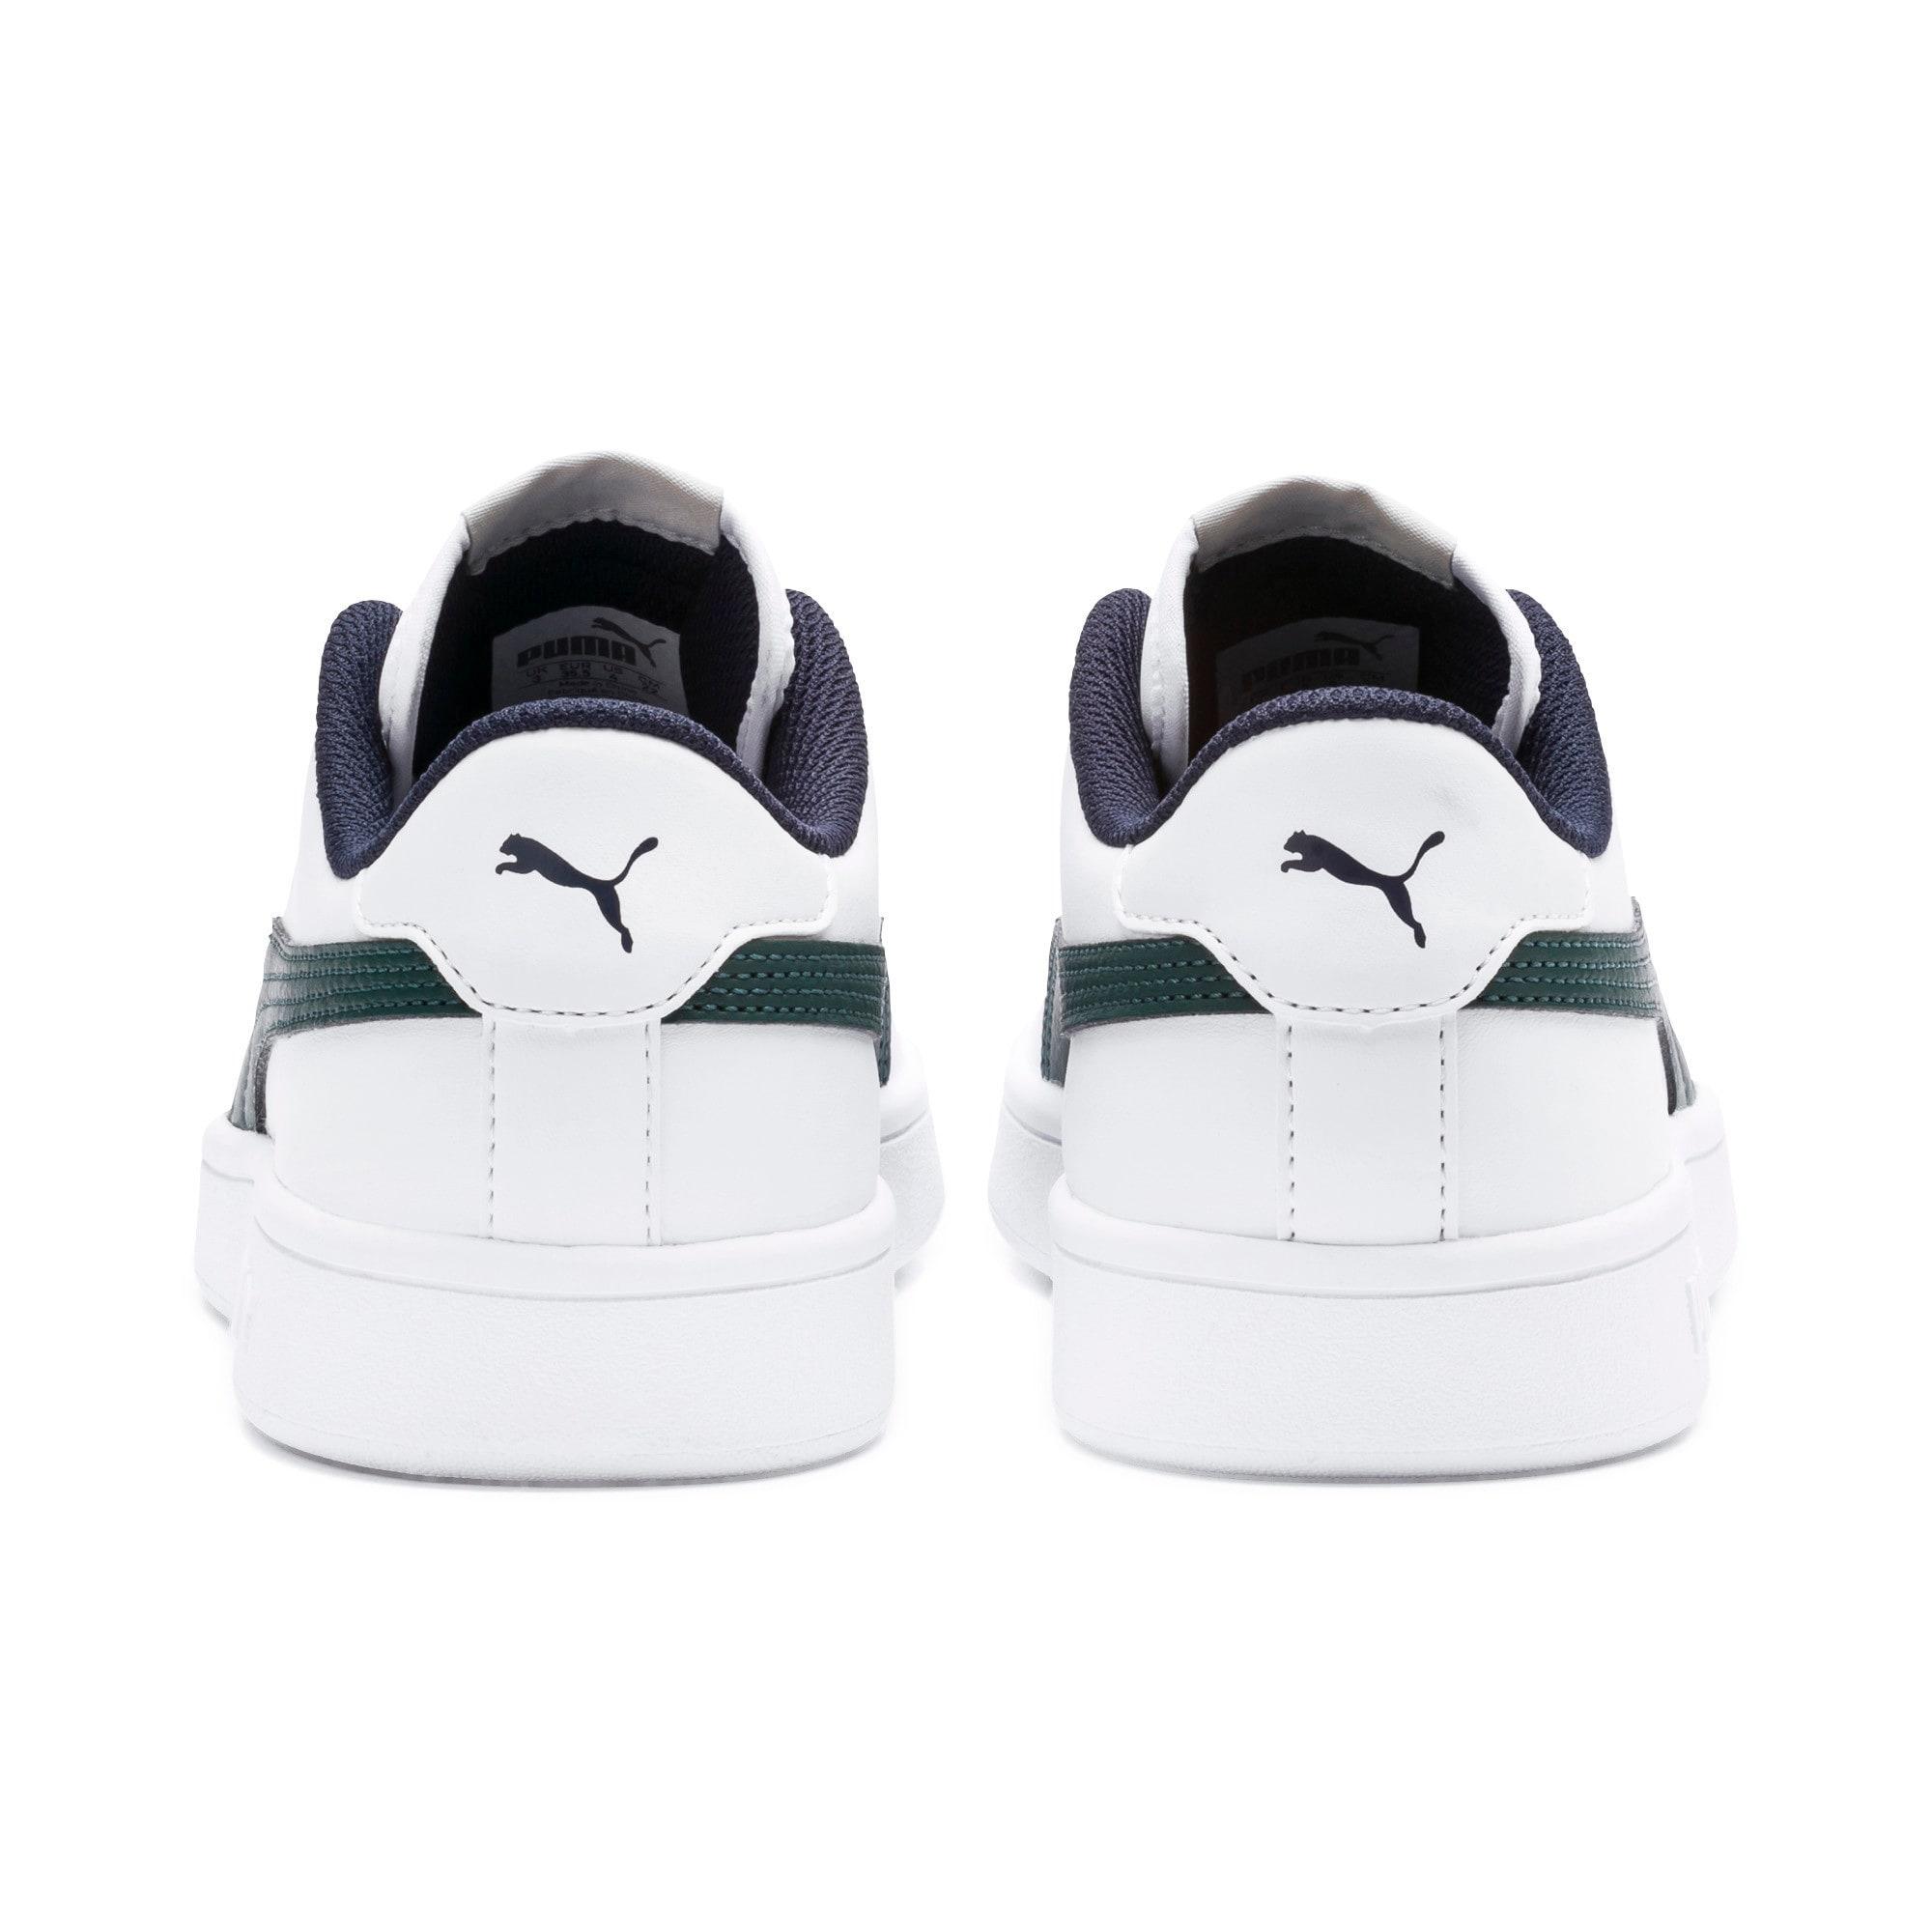 Thumbnail 3 of PUMA Smash v2 Youth Sneaker, Puma White-Ponderosa Pine, medium